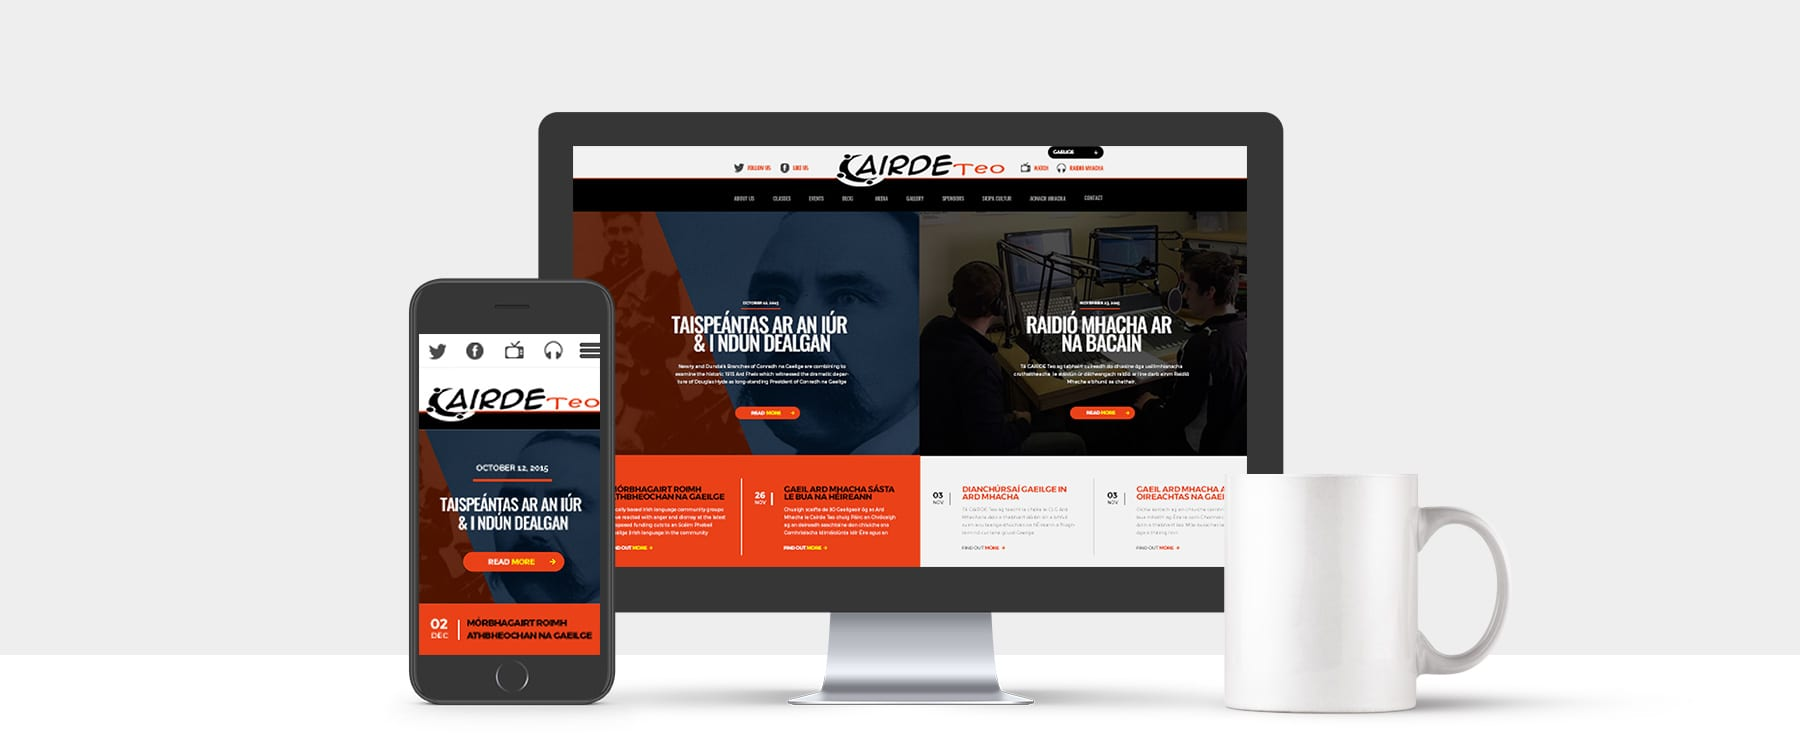 CAIRDE Teo Wins 'Best Irish Language Website' Image